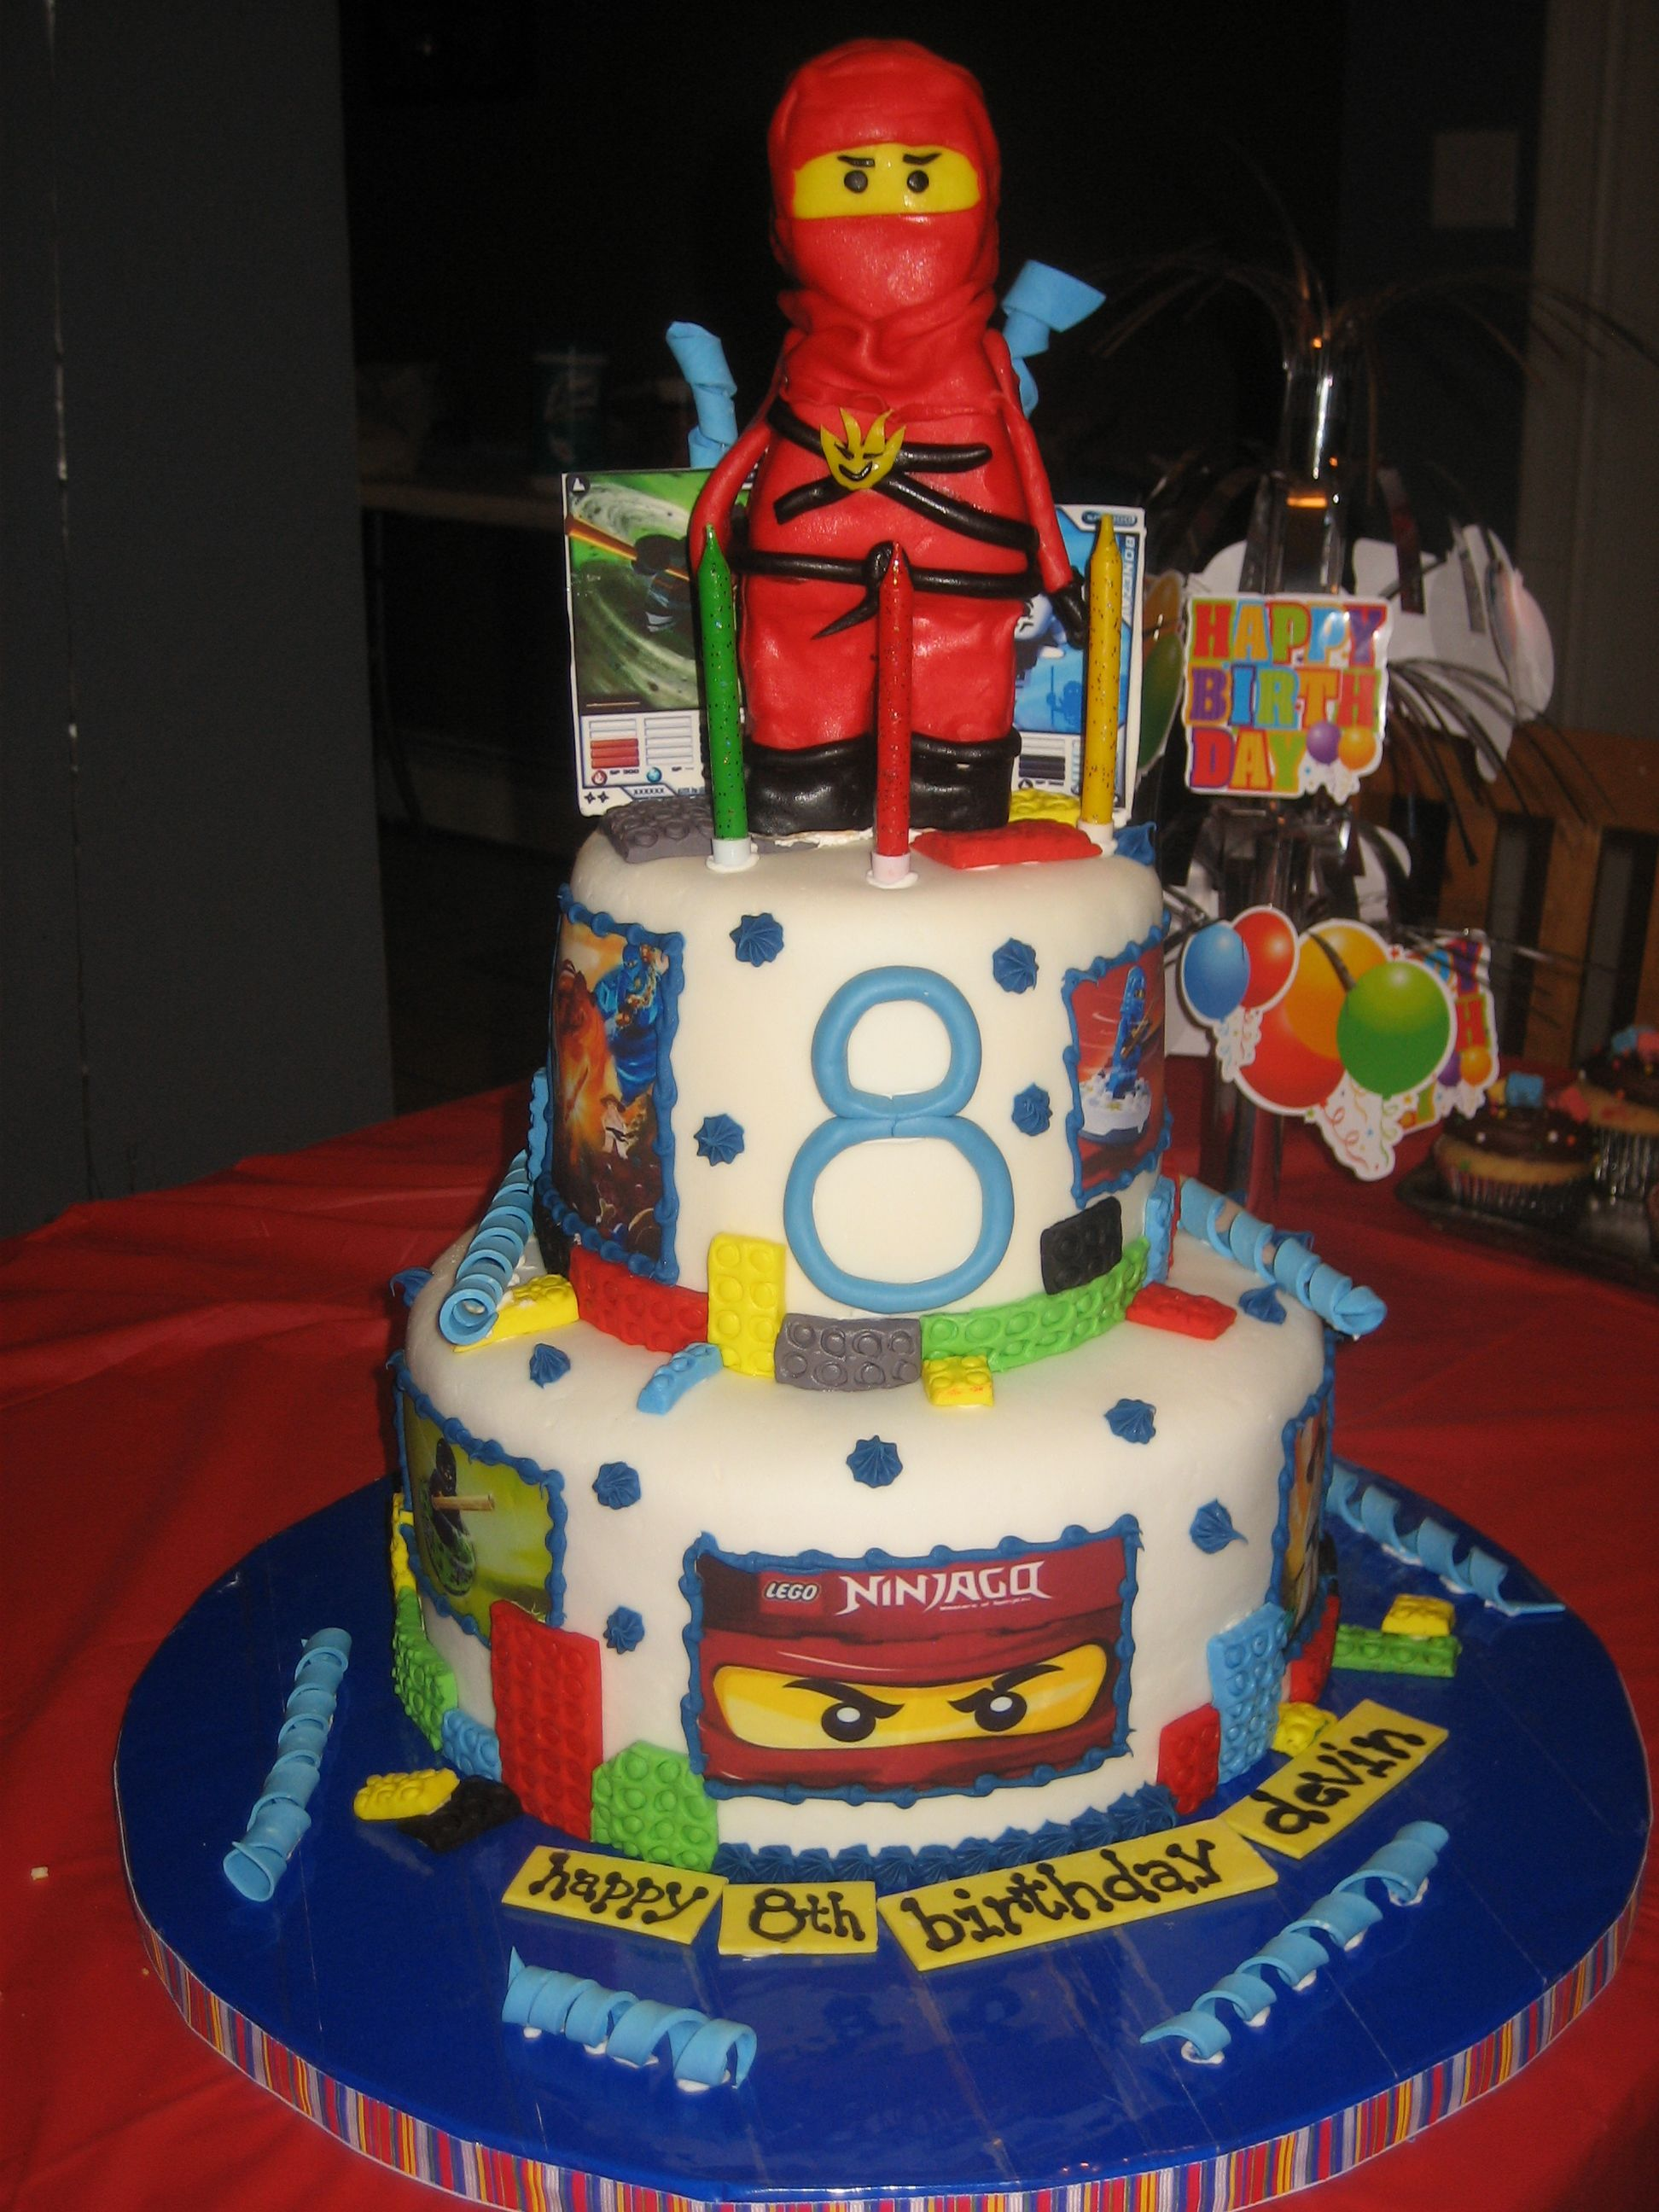 Lego Ninjago Birthday Cake | Kristens Cakes and Kreations